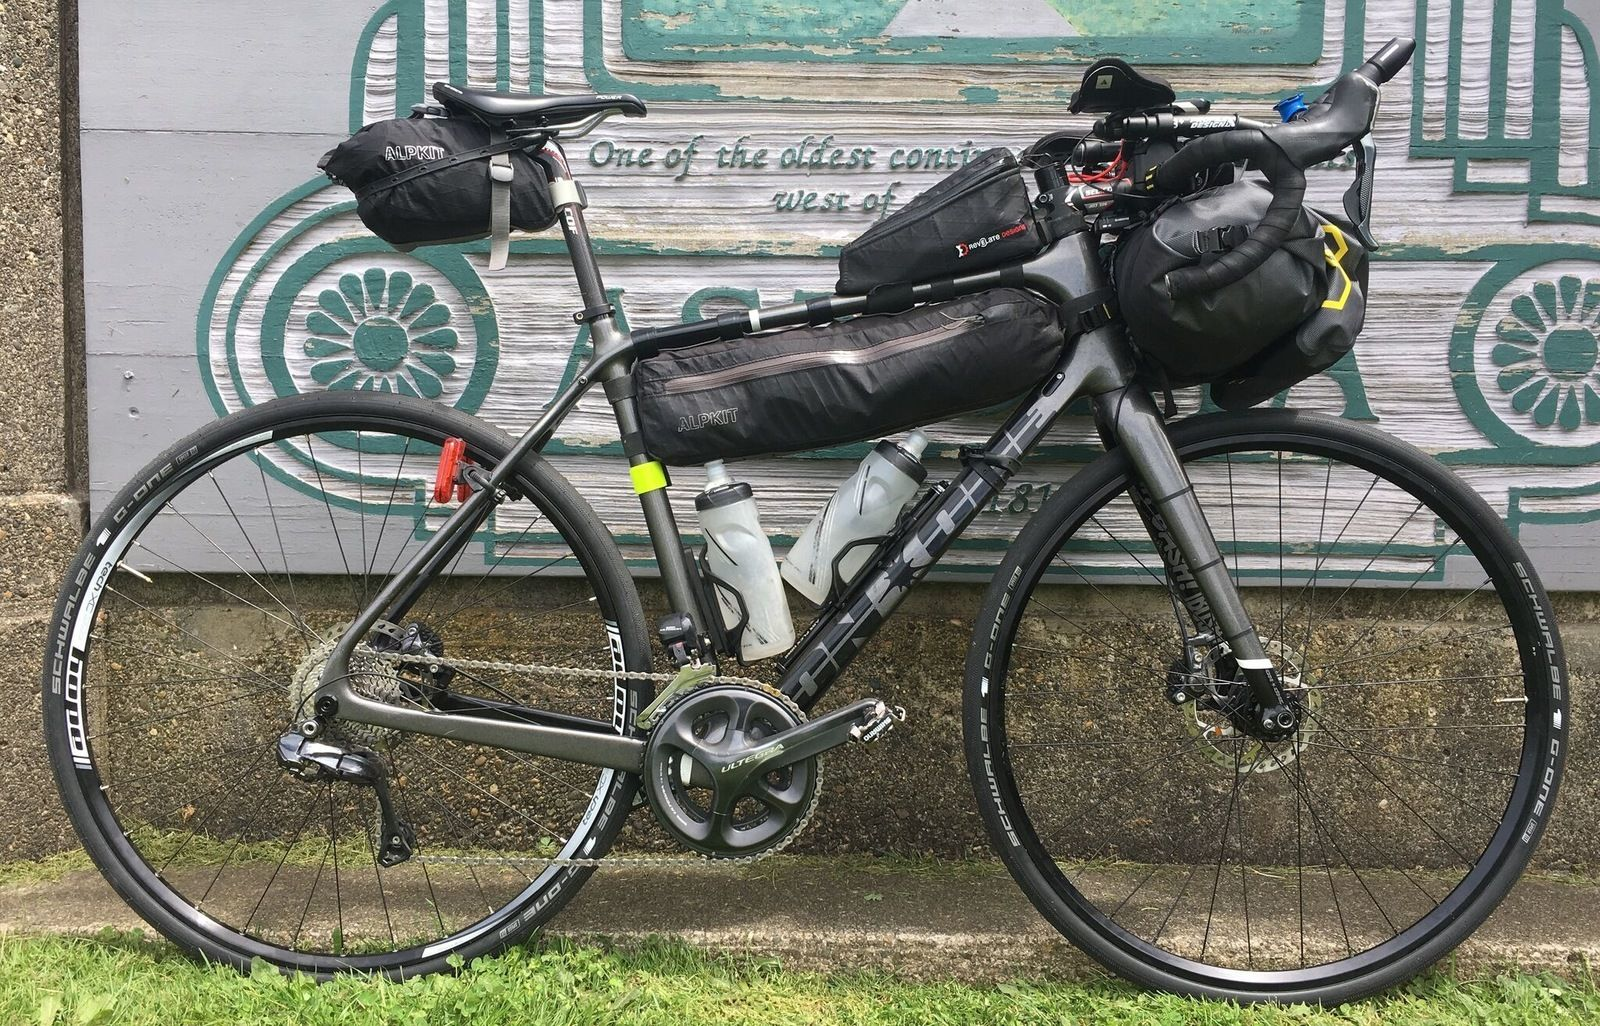 Antons-cykel-01.jpg